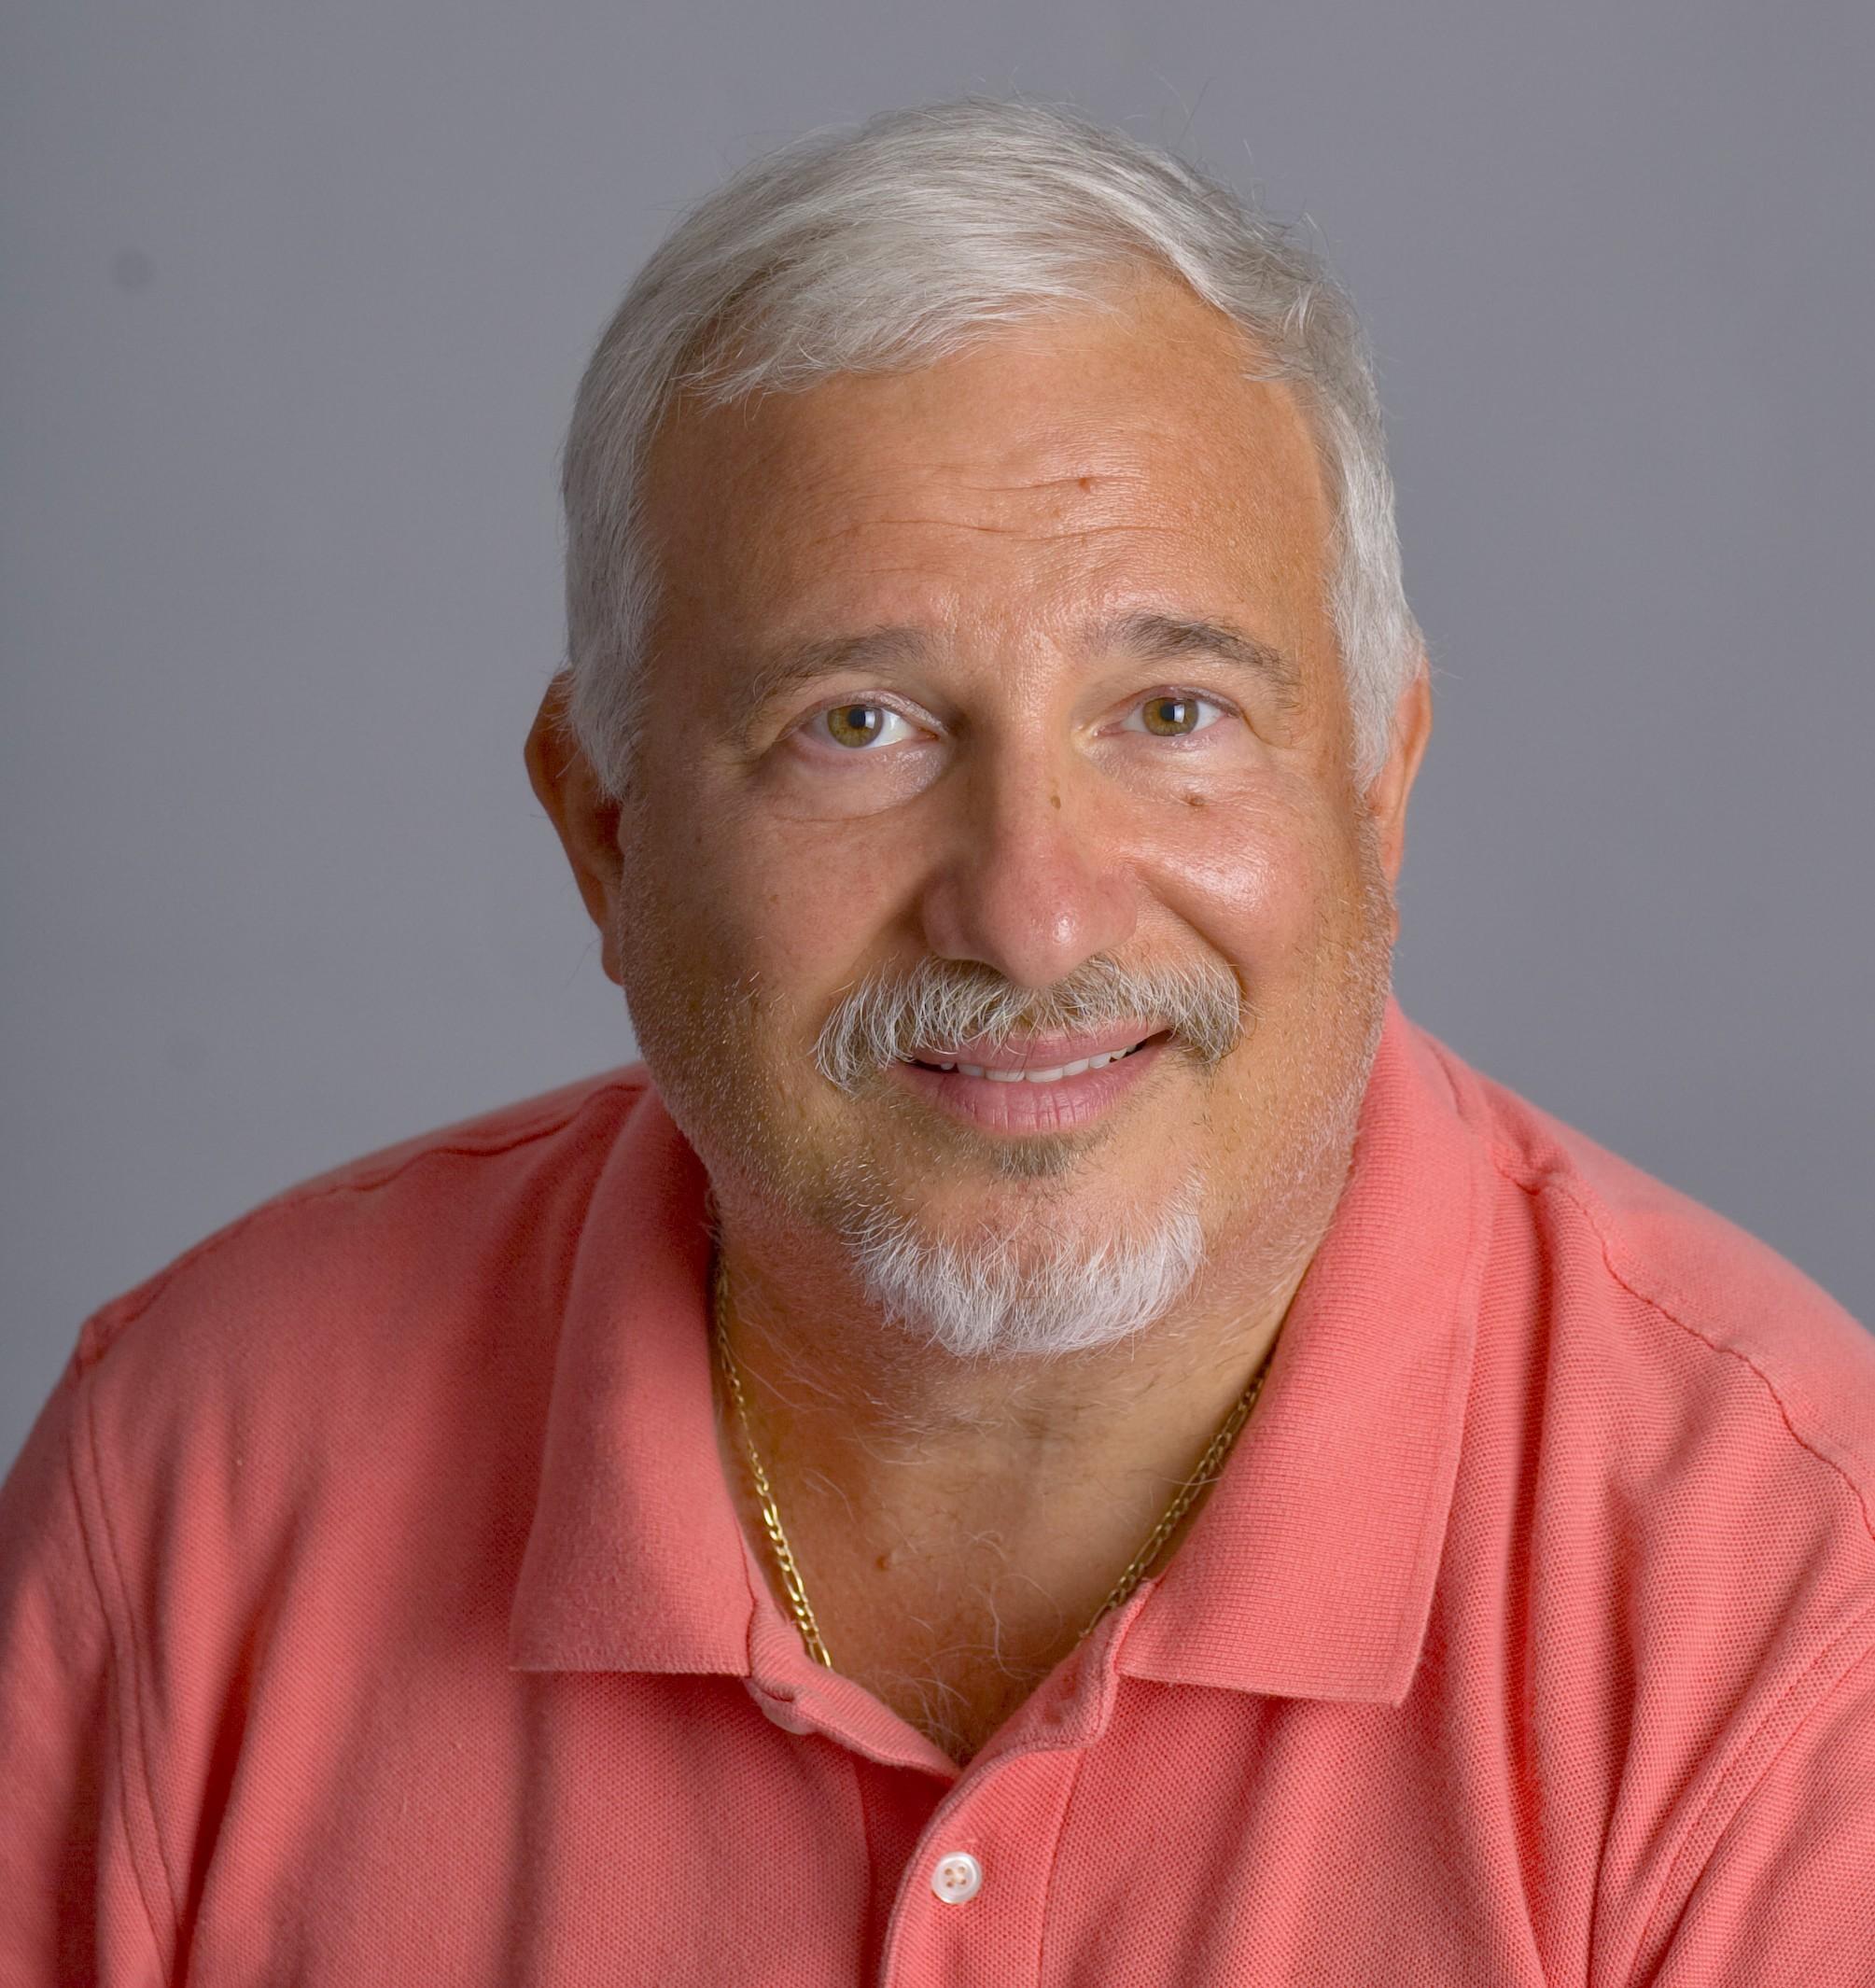 Michael Denapoli, LICSW